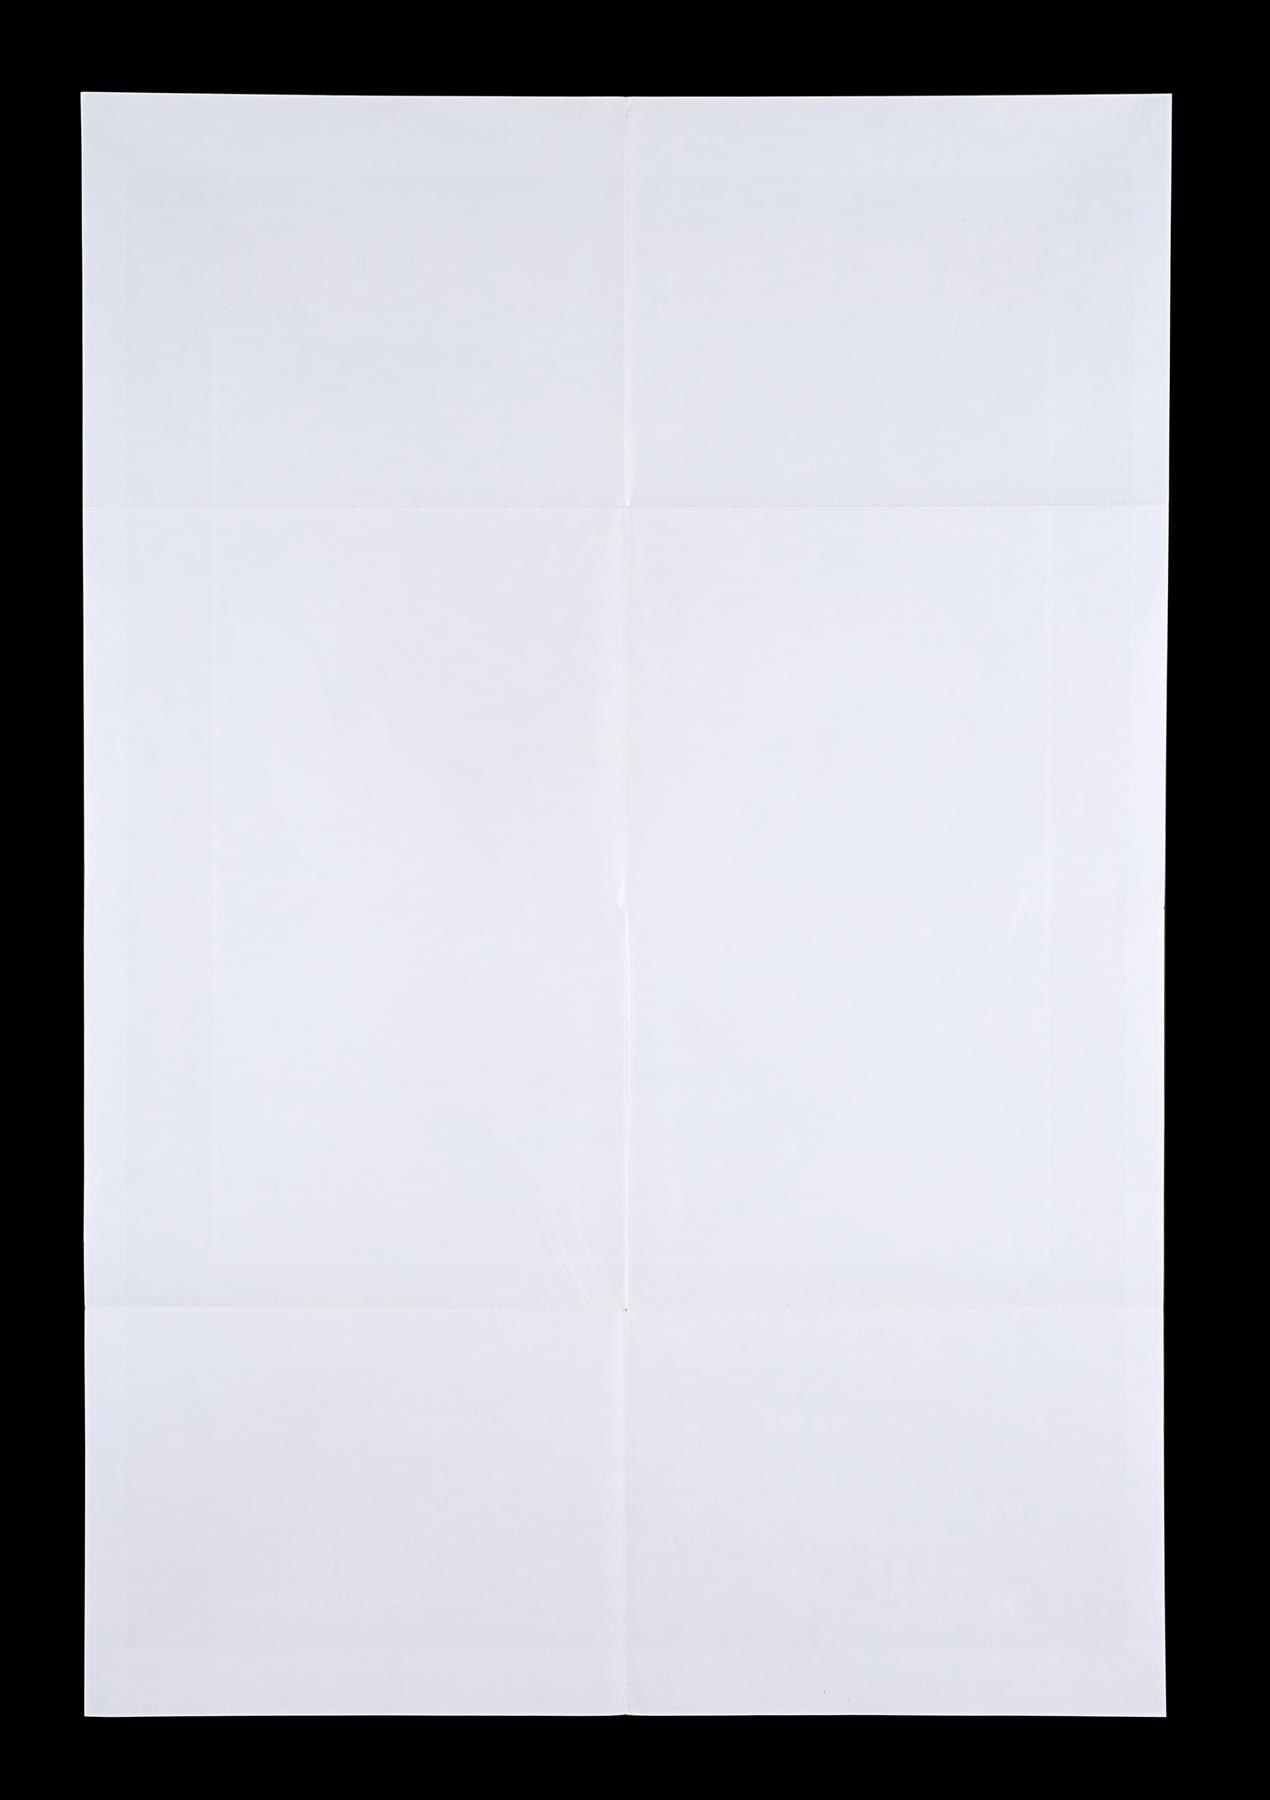 DEER HUNTER (1978), PLATOON (1986), RAGING BULL (1980) - Two UK Quads, US One-Sheet, 1978, 1980, 198 - Image 3 of 7